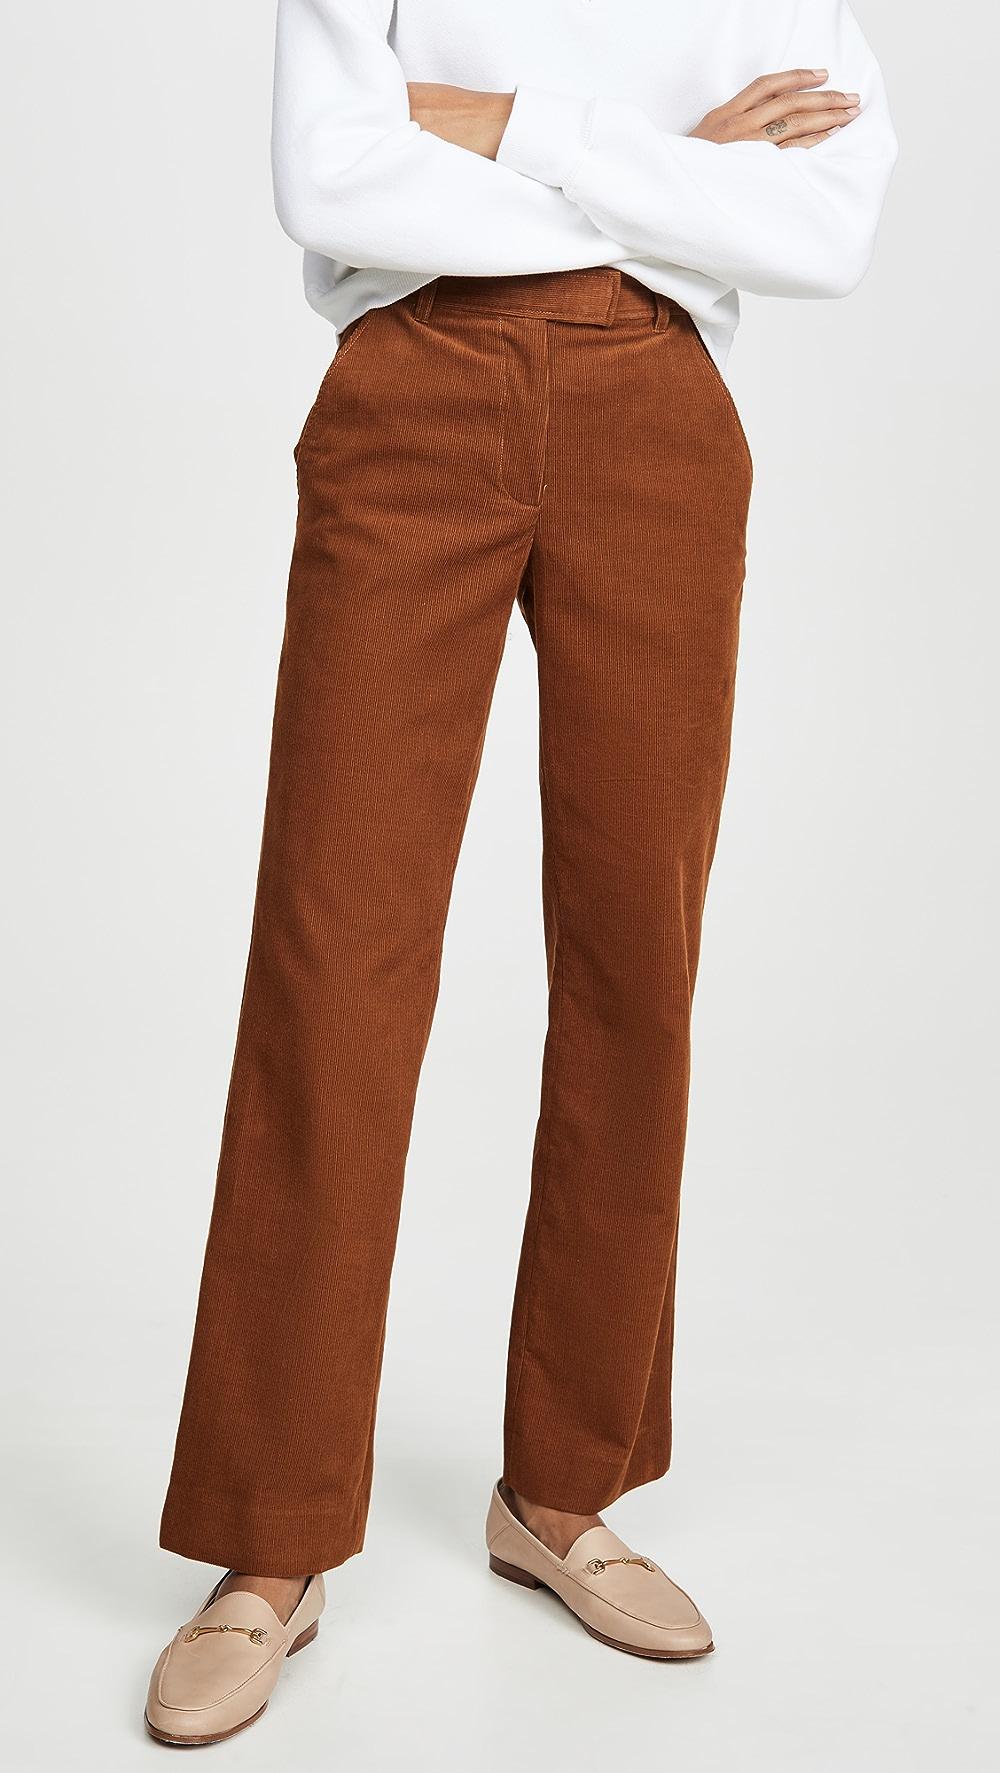 2019 Latest Design A.p.c. - Pantalon Albane Distinctive For Its Traditional Properties